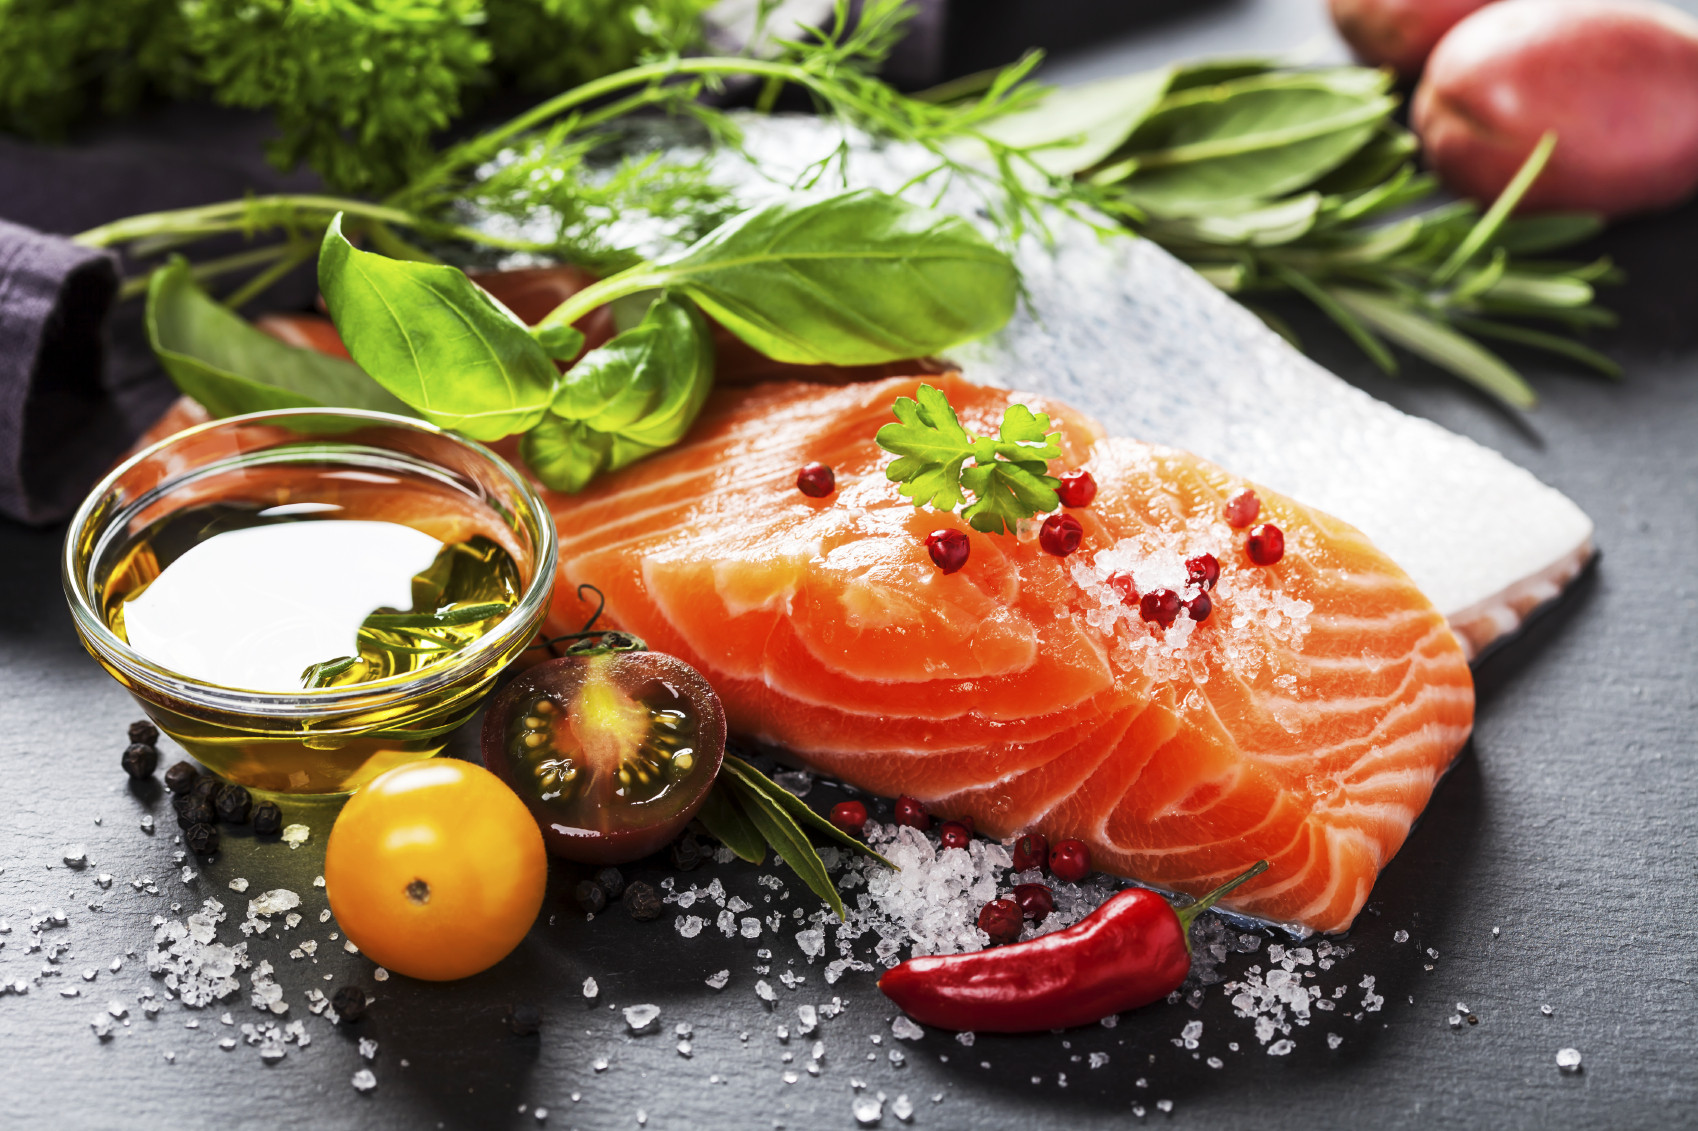 mediterranean-diet-fish-oil-healthy-food